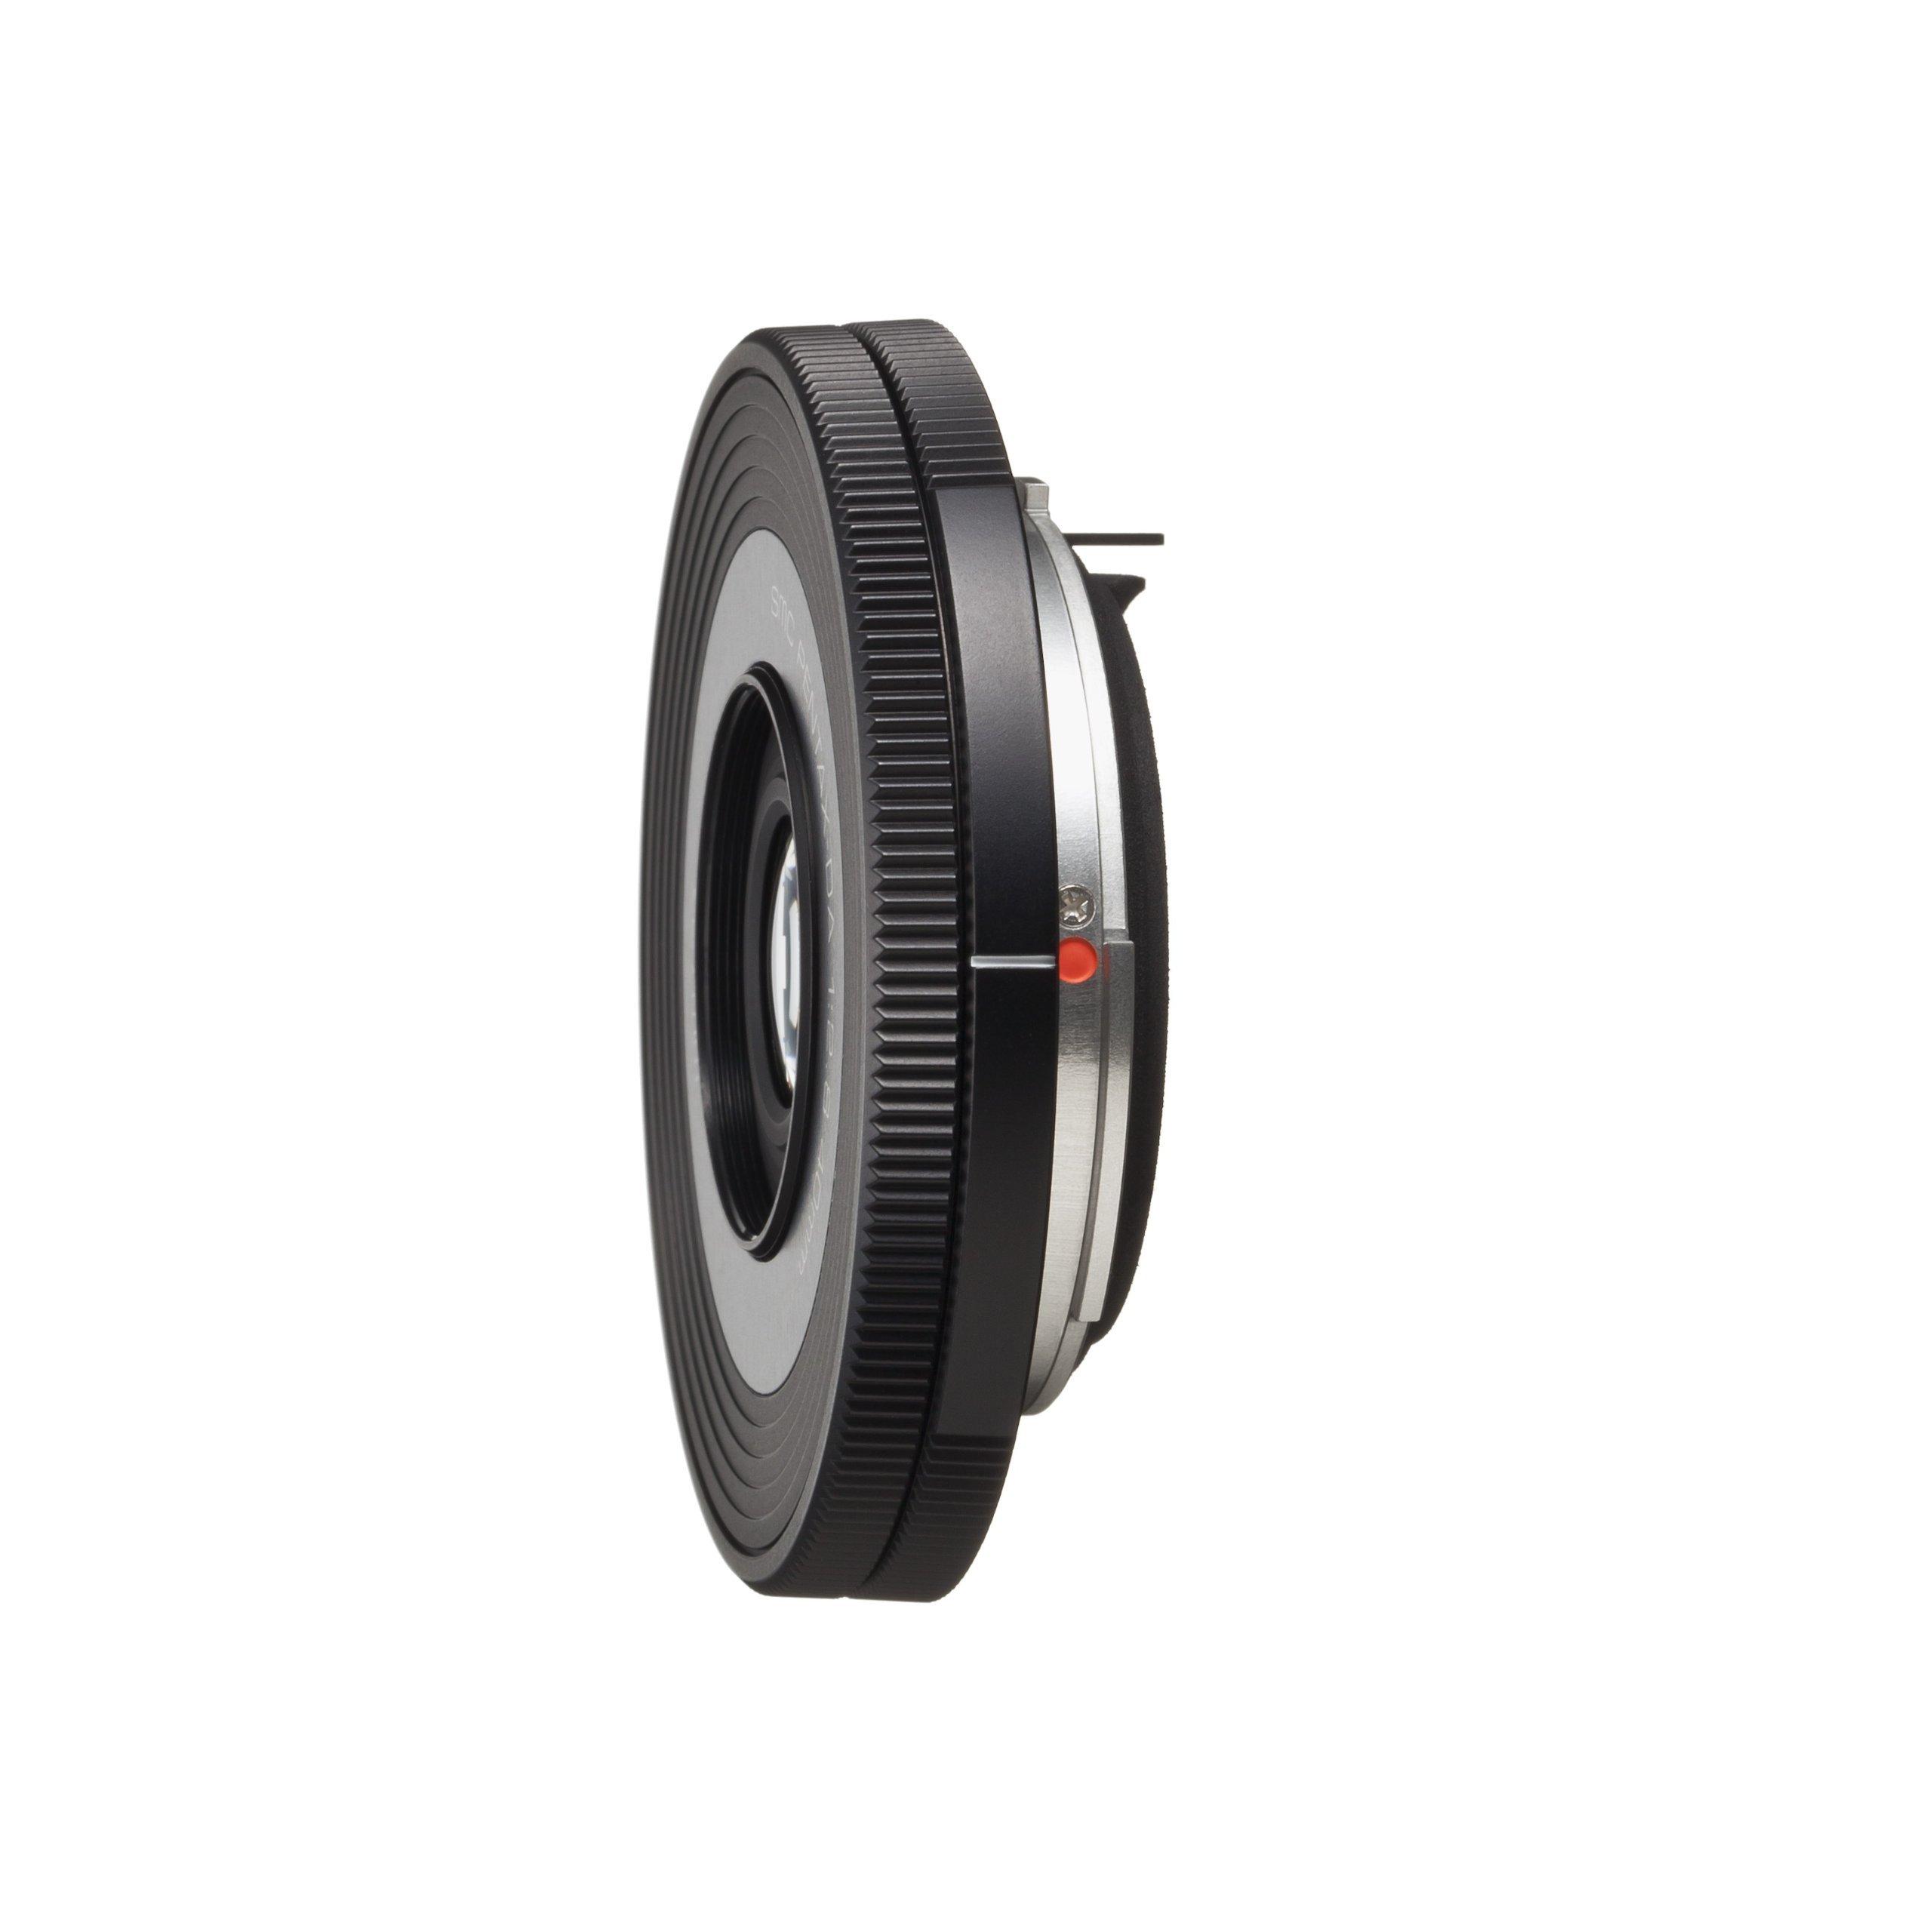 Pentax DA 40mm f/2.8 XS Lens by Pentax